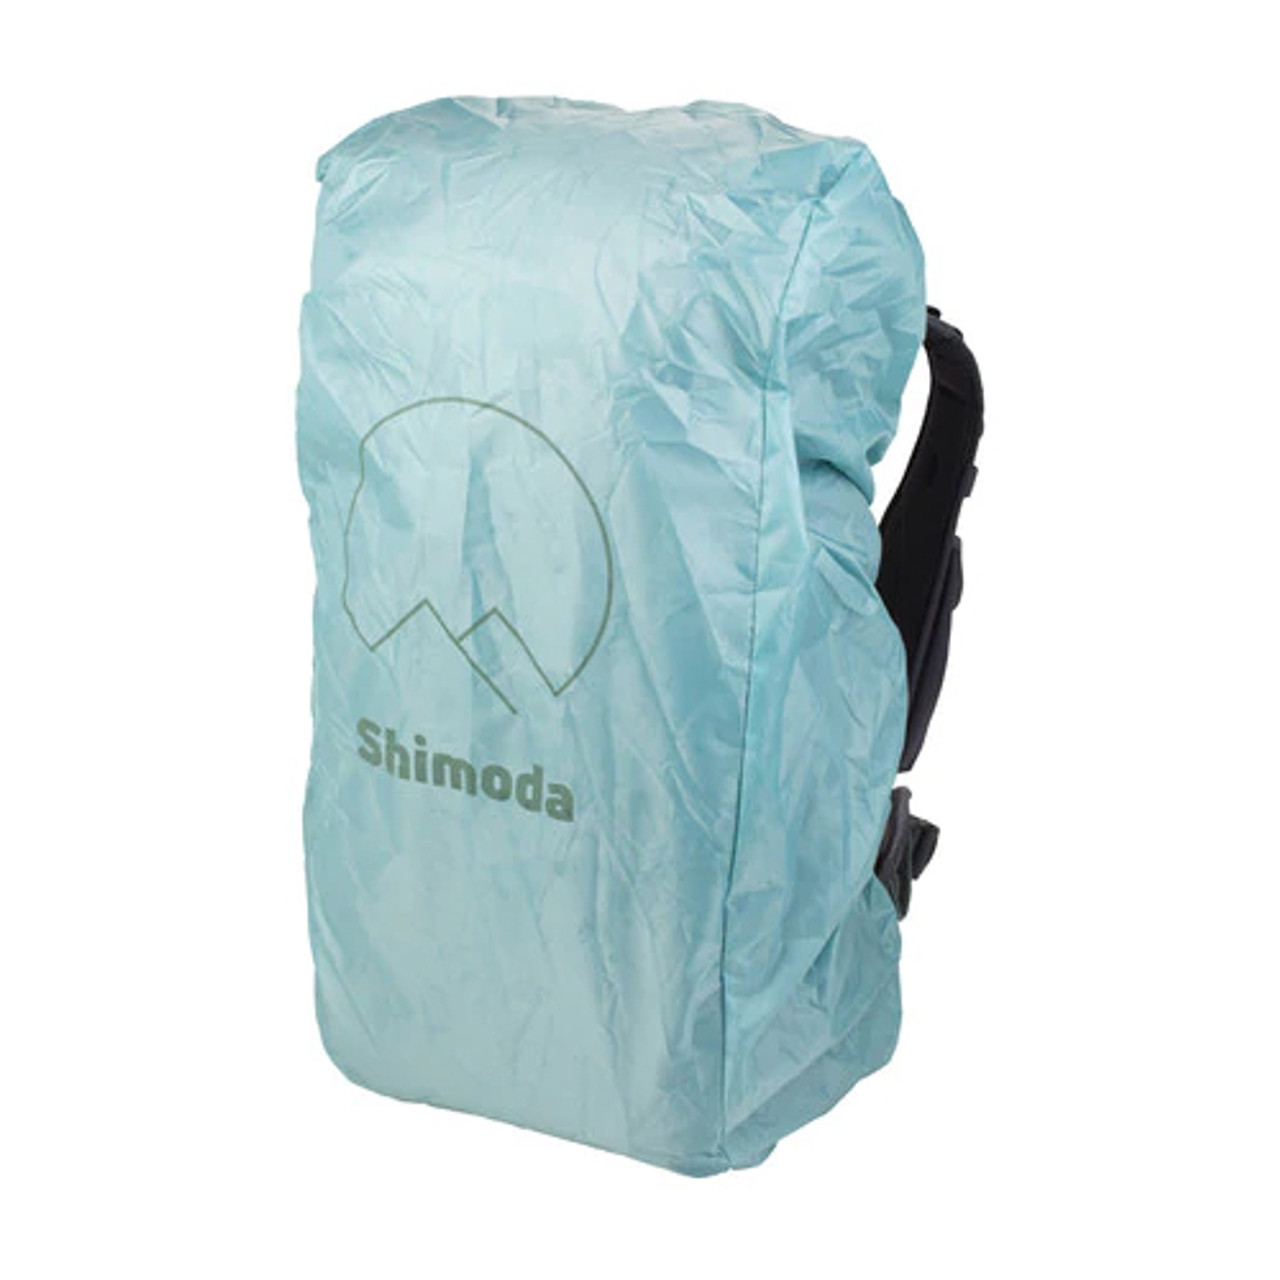 SHIMODA RAIN COVERS (BLUE)